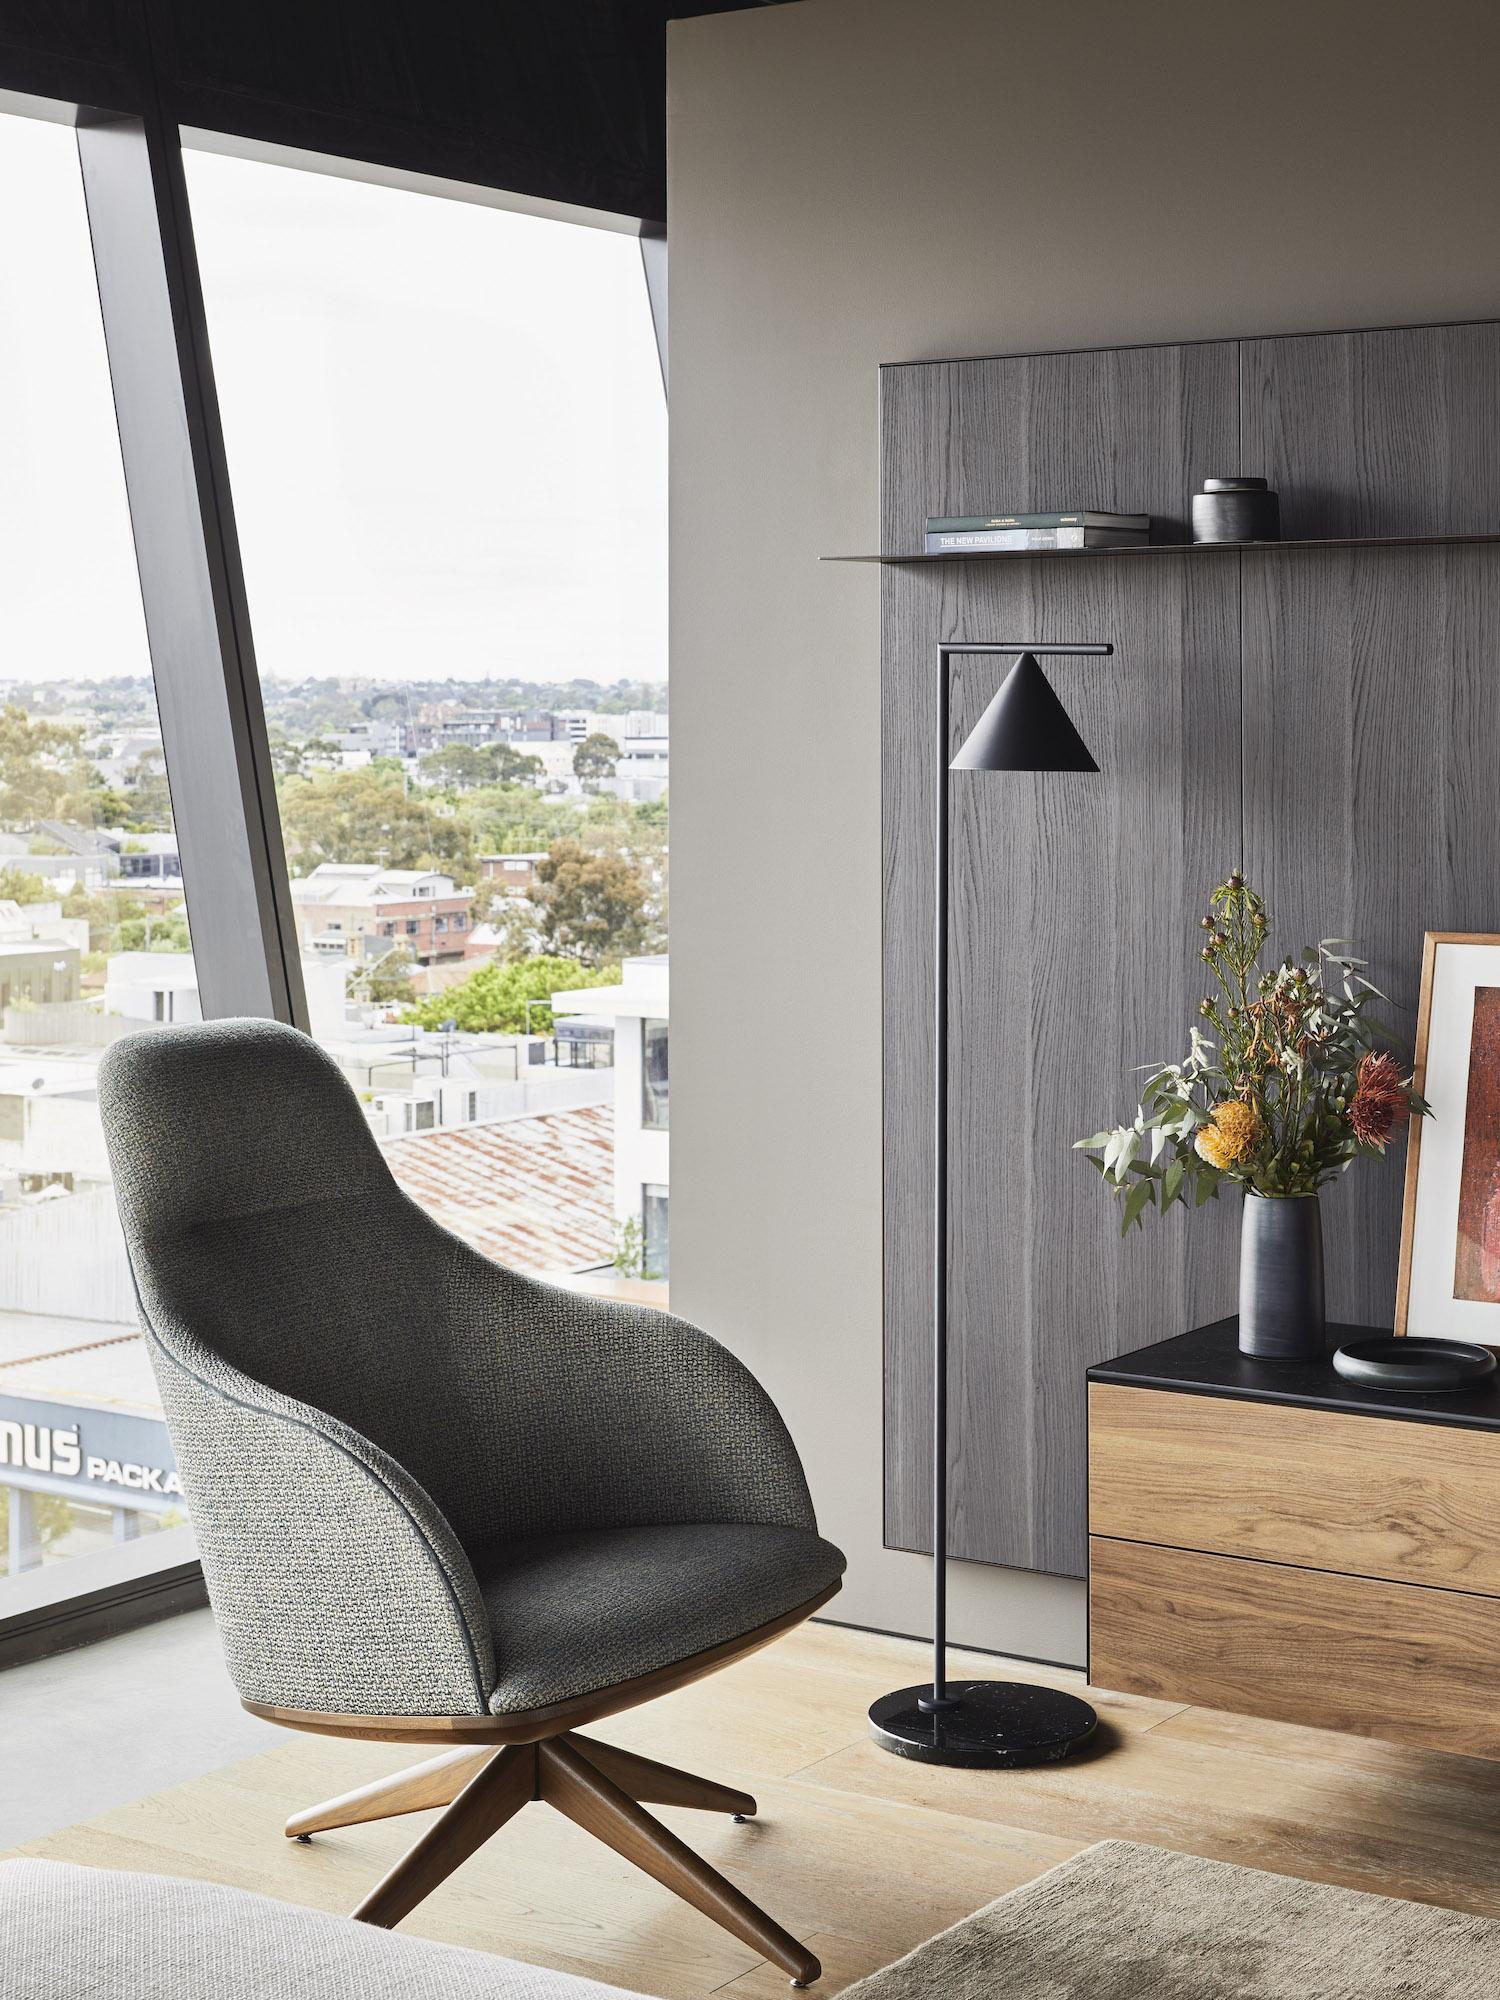 est living cosh living showroom by justin hutchinson 05 1